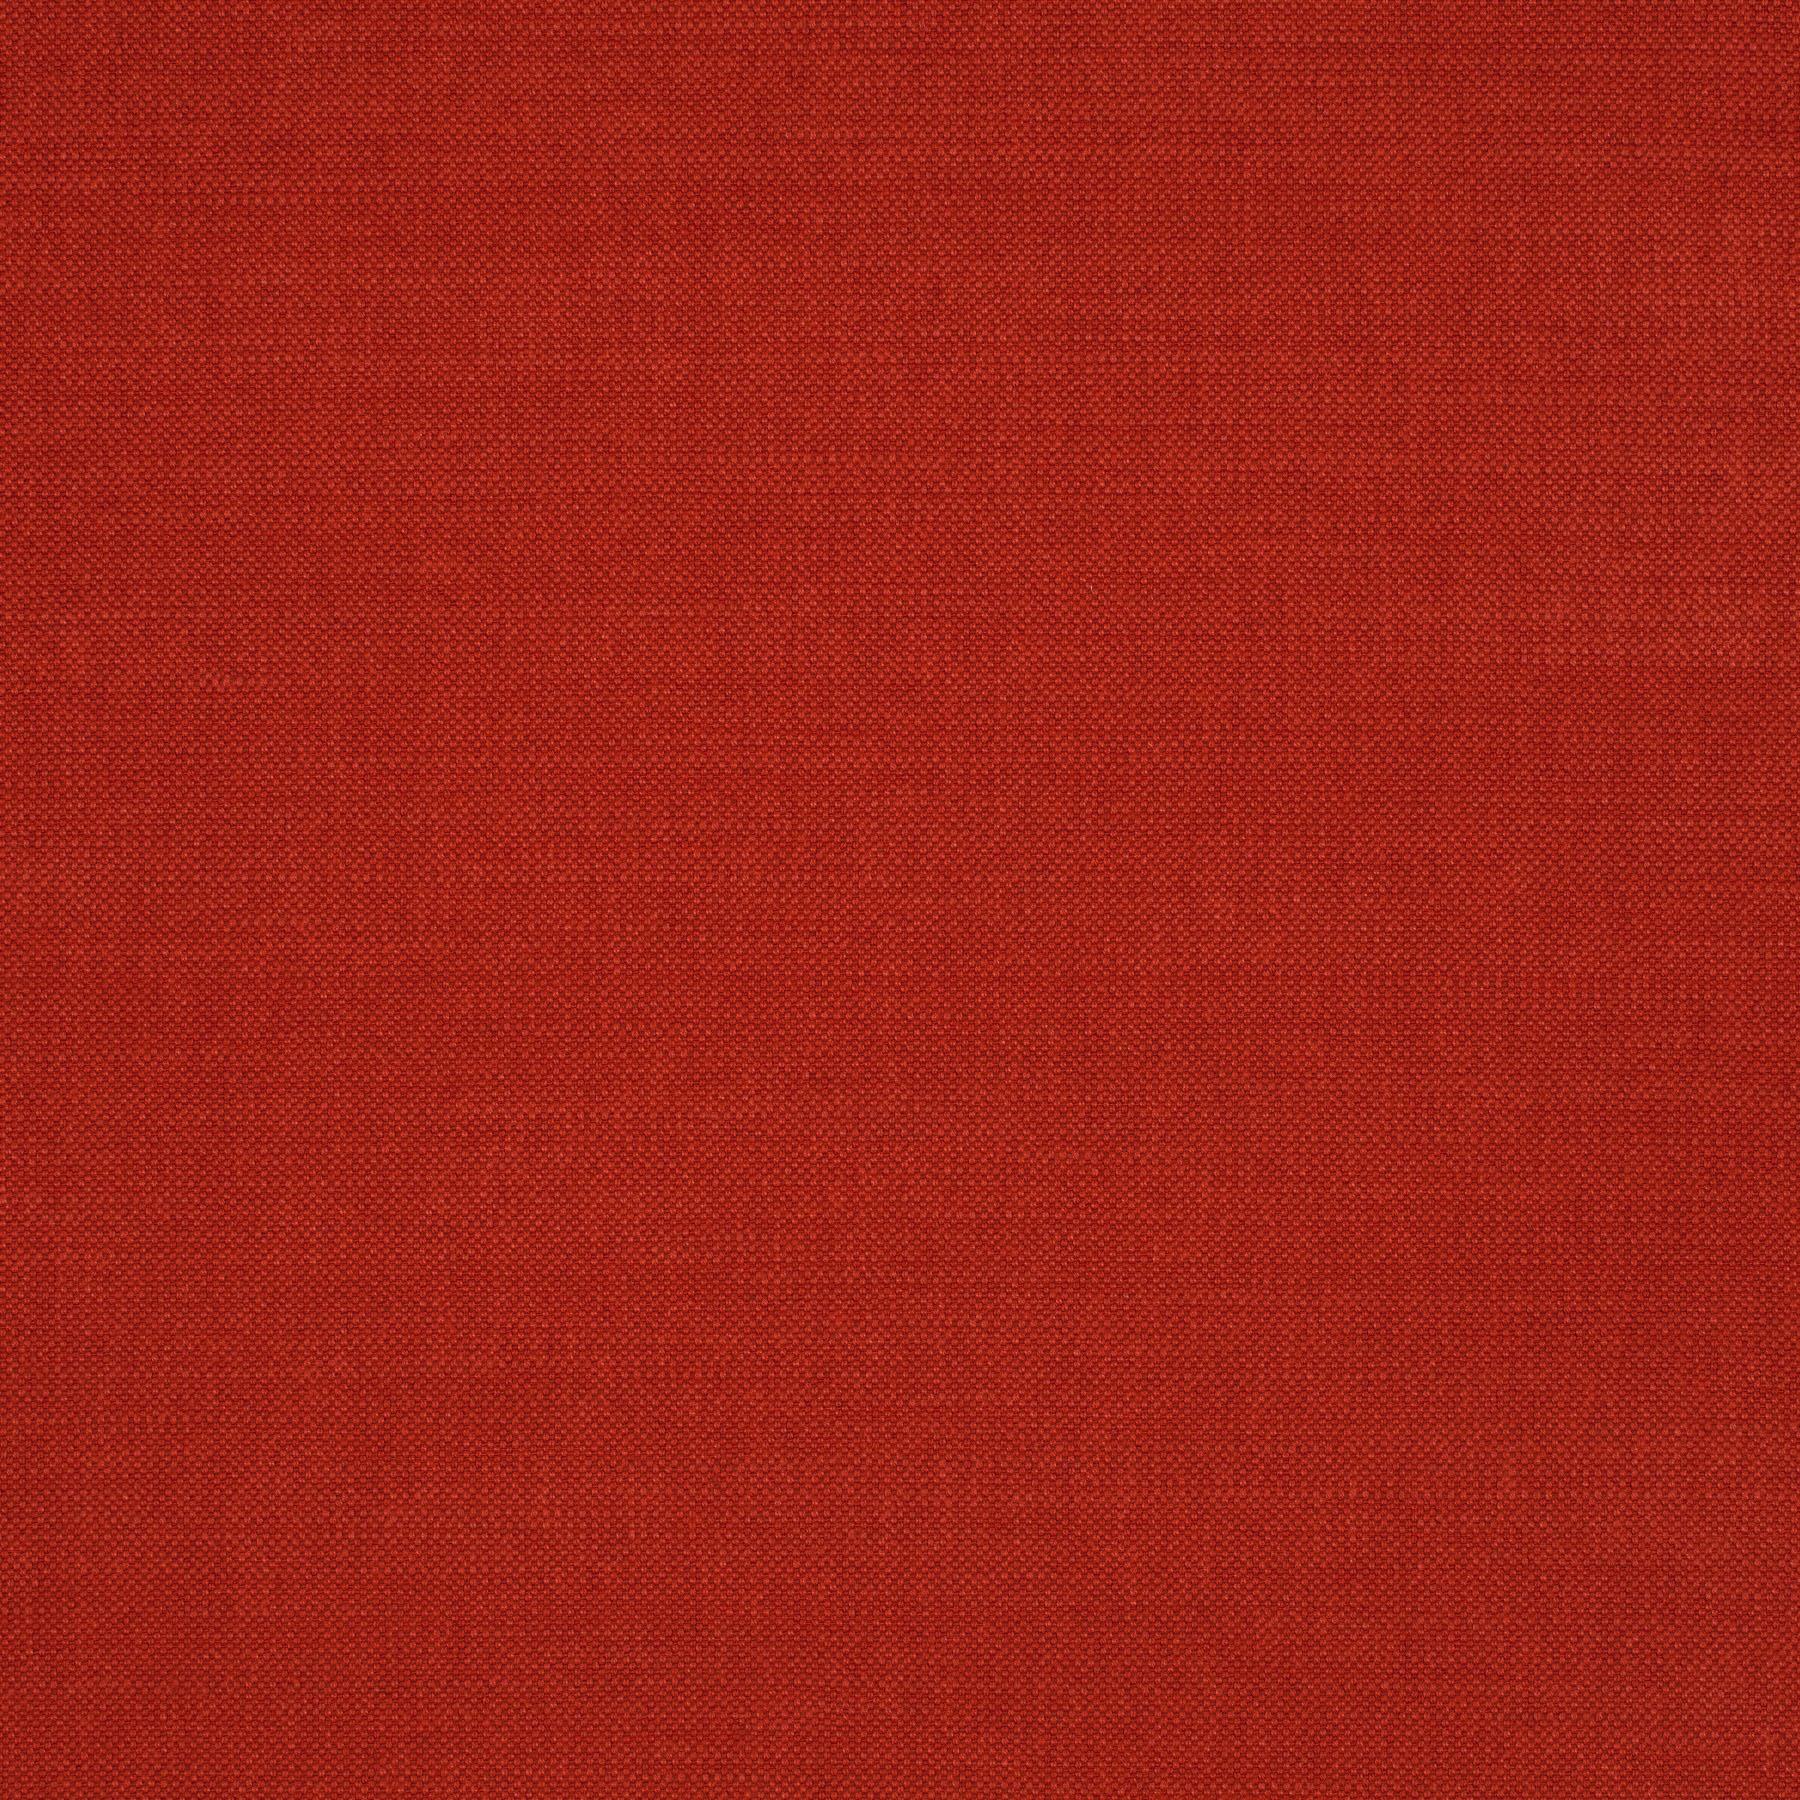 bordeaux rød hot madison-0